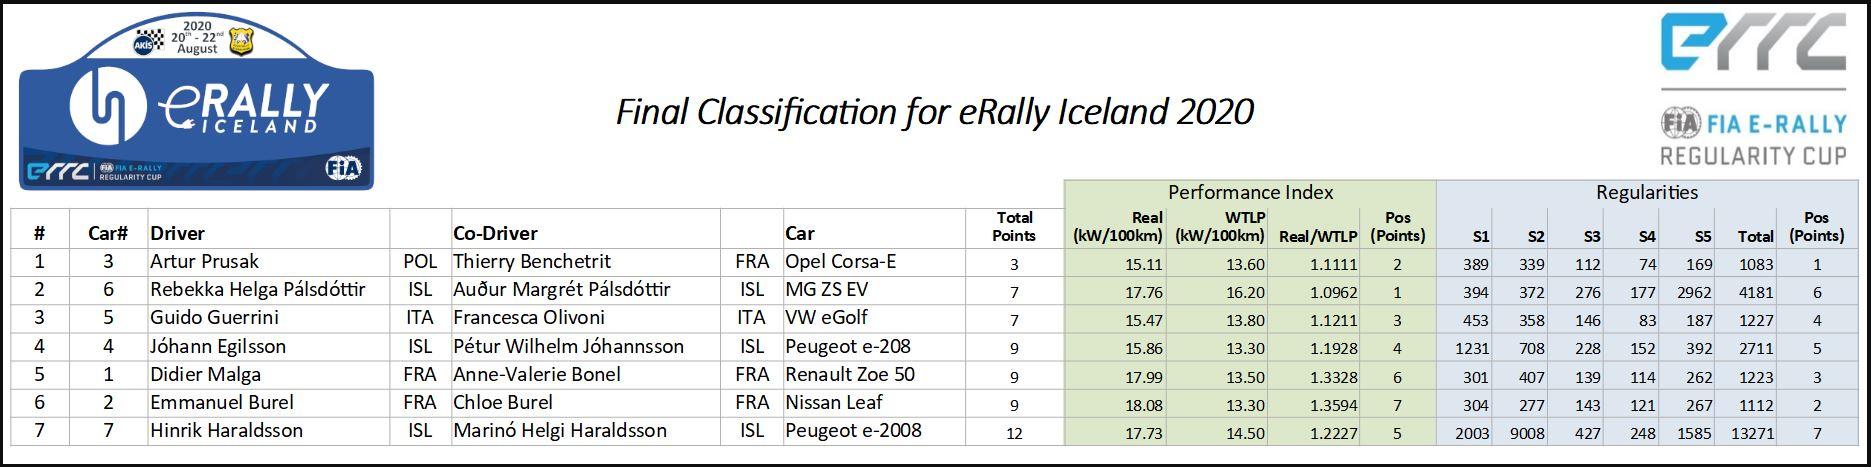 erally-final-classification